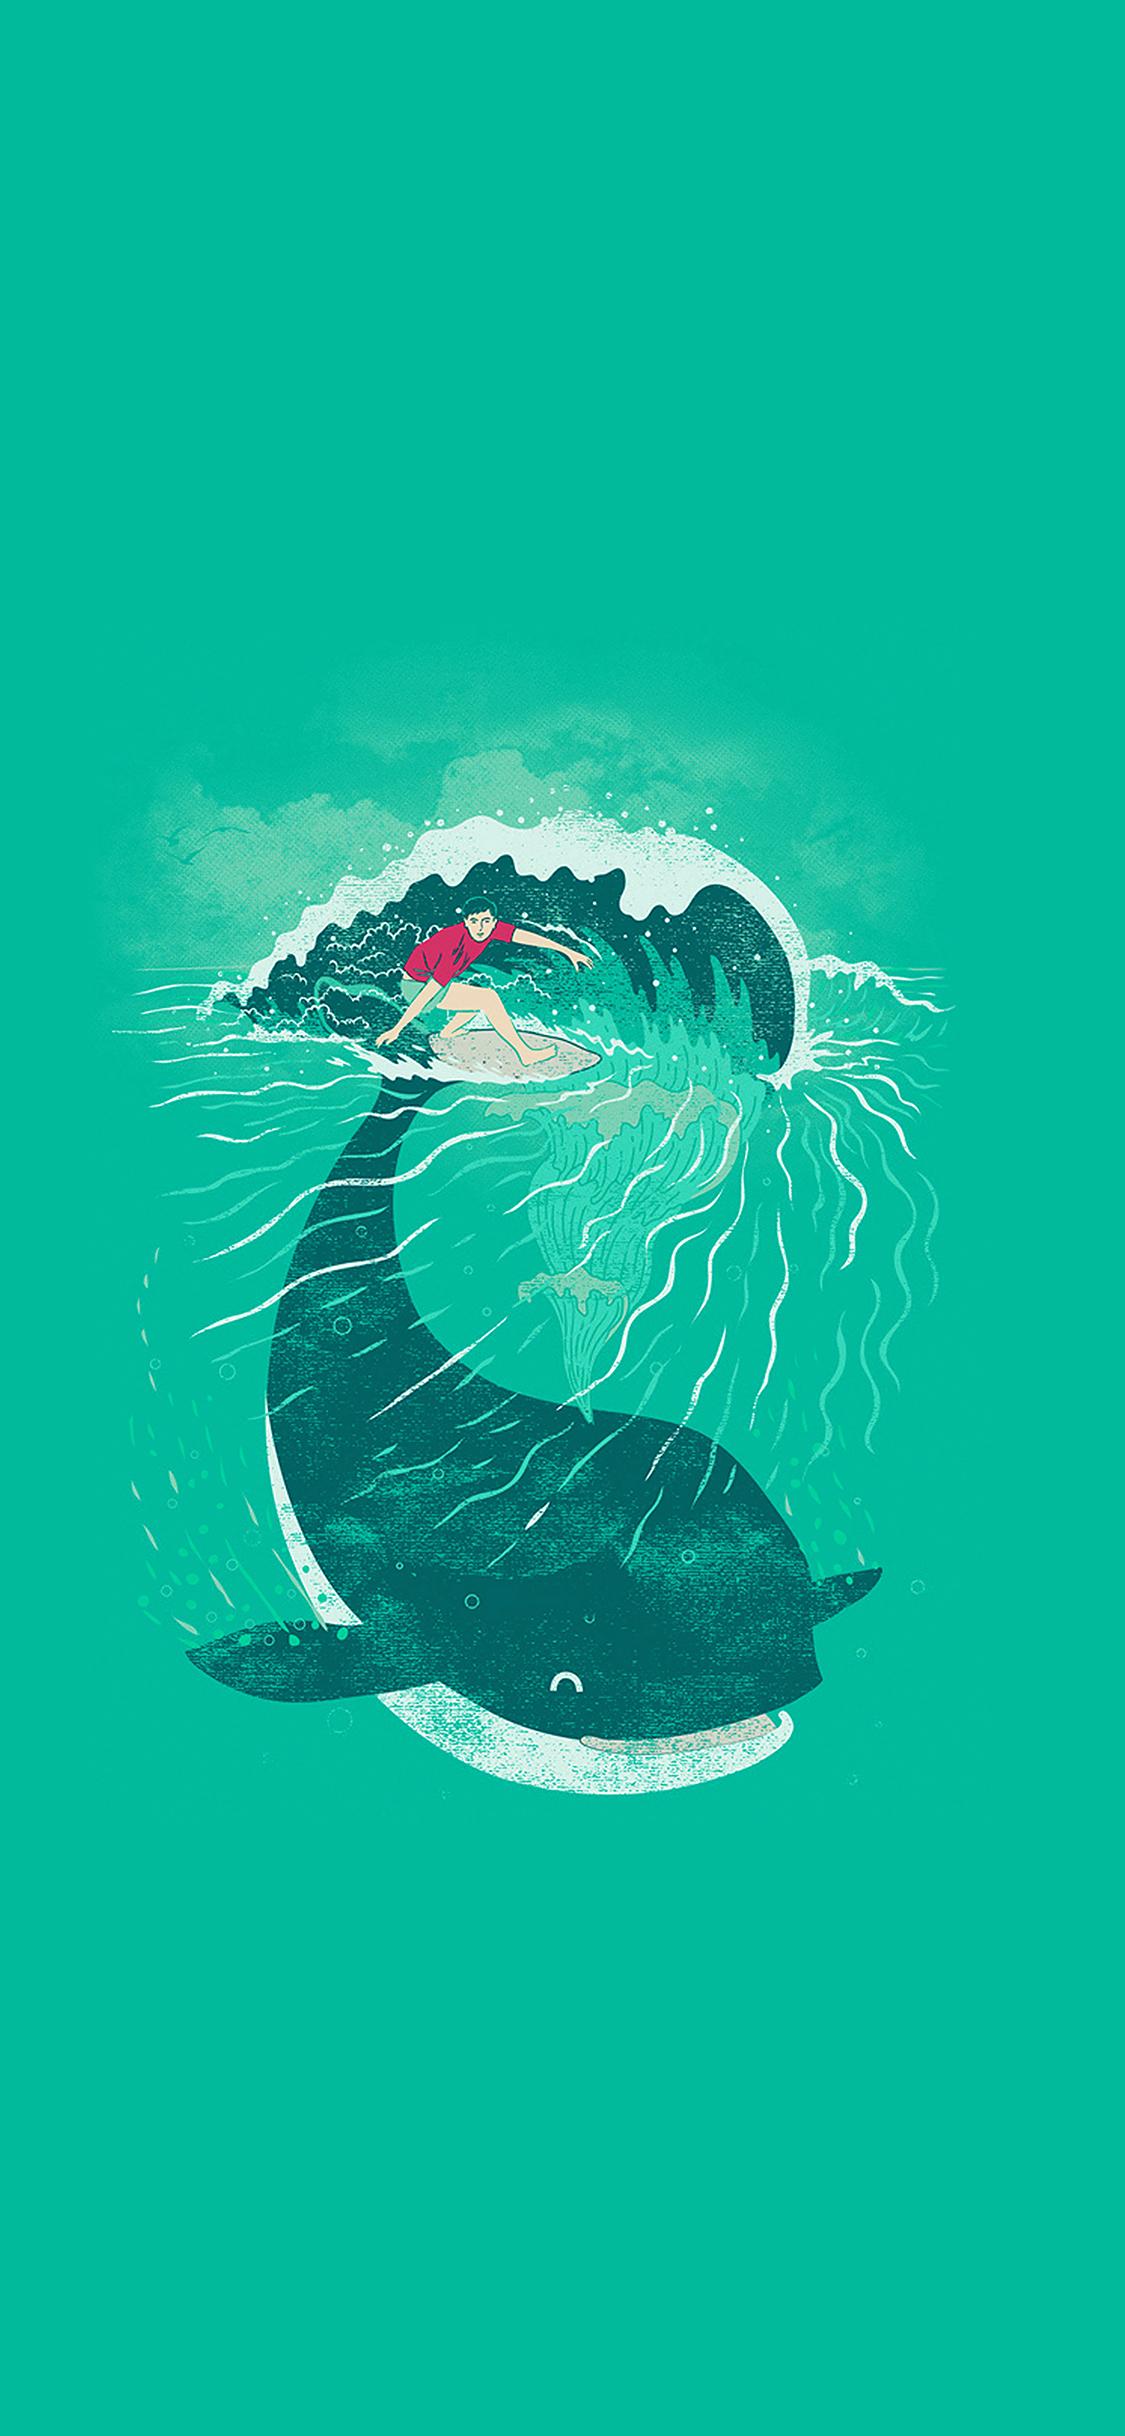 Girl Wallpapers Hd Iphone Ah85 Whale Surfer Wave Animal Illust Art Sea Wallpaper